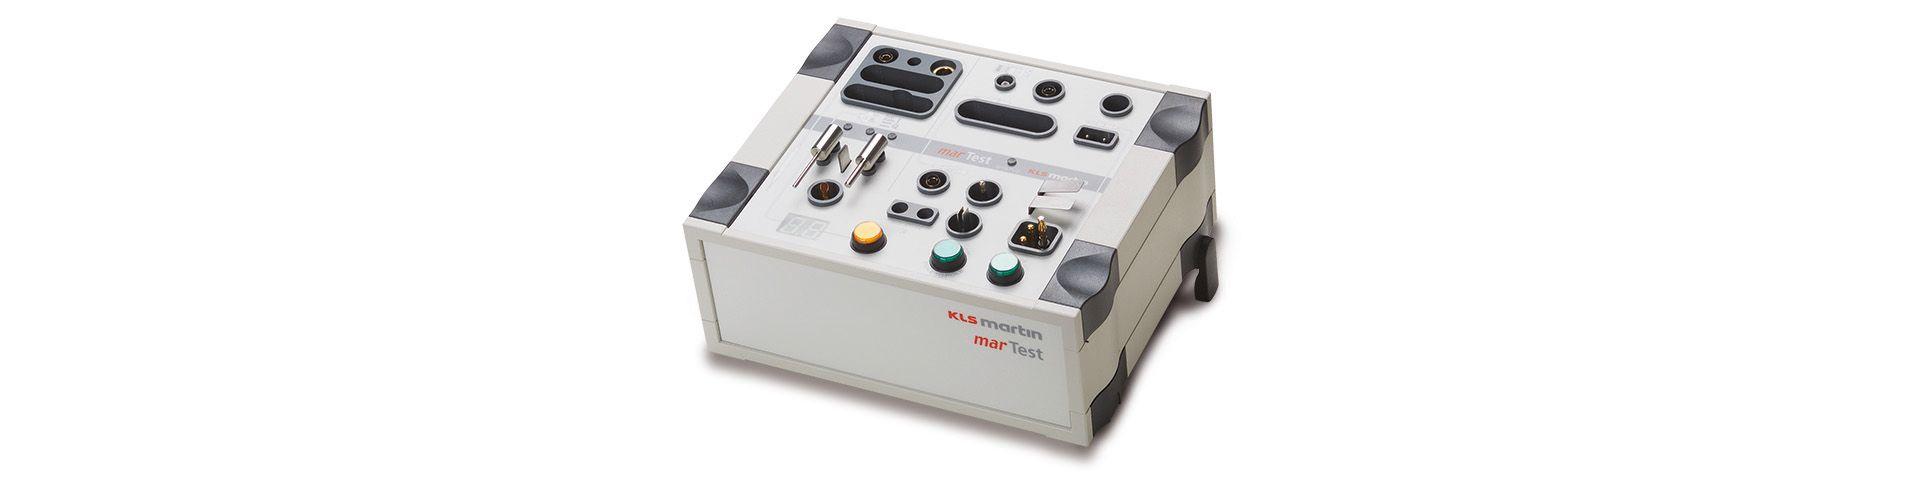 Electrosurgery - marTest